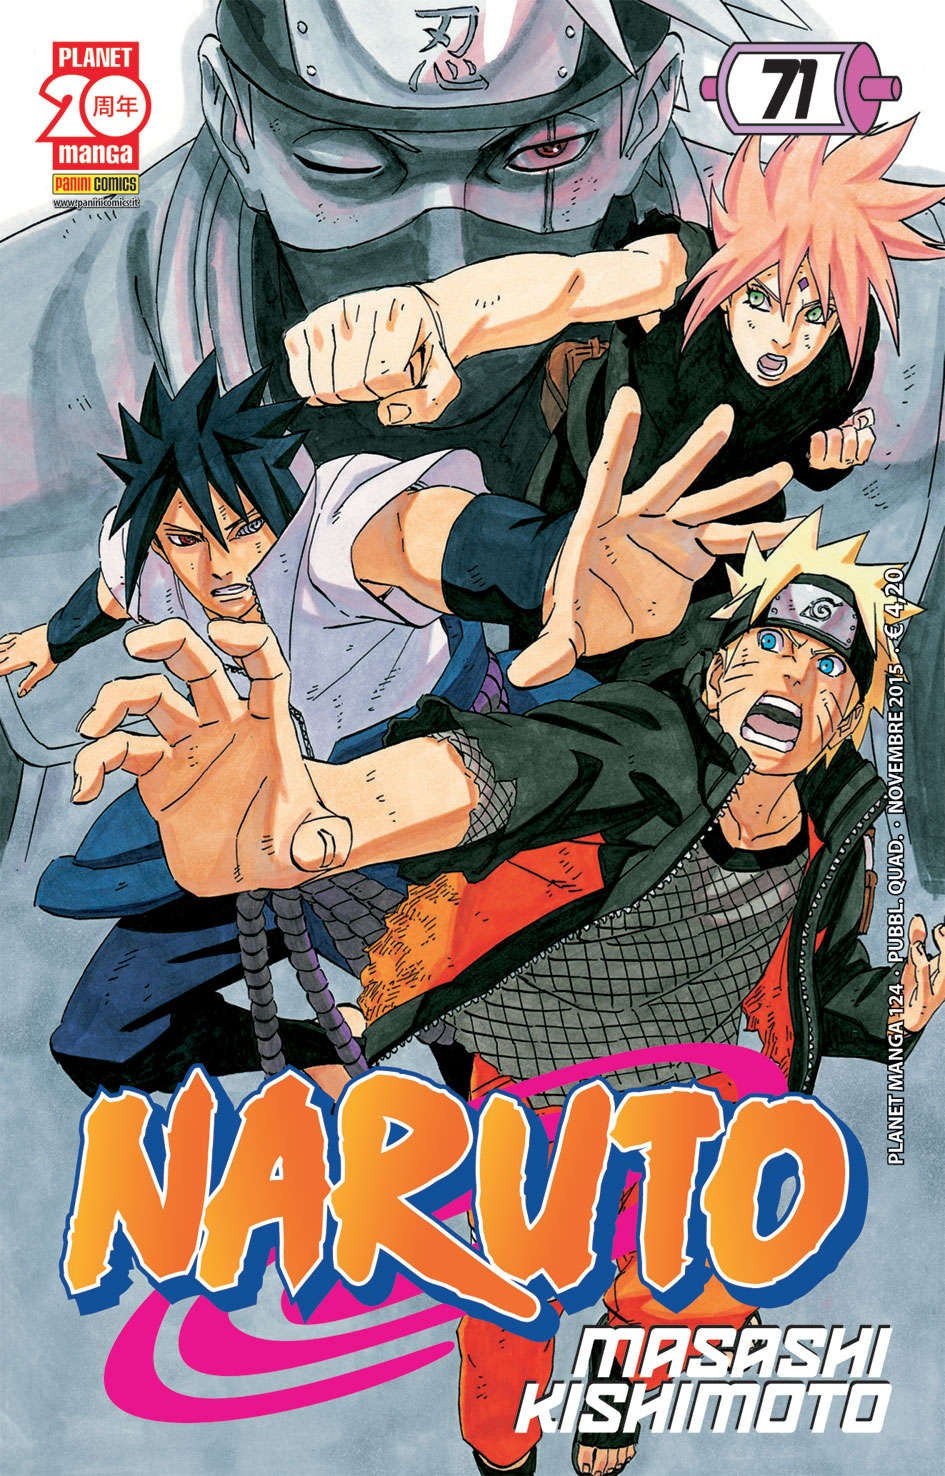 Naruto - N° 71 - Naruto - Planet Manga Planet Manga